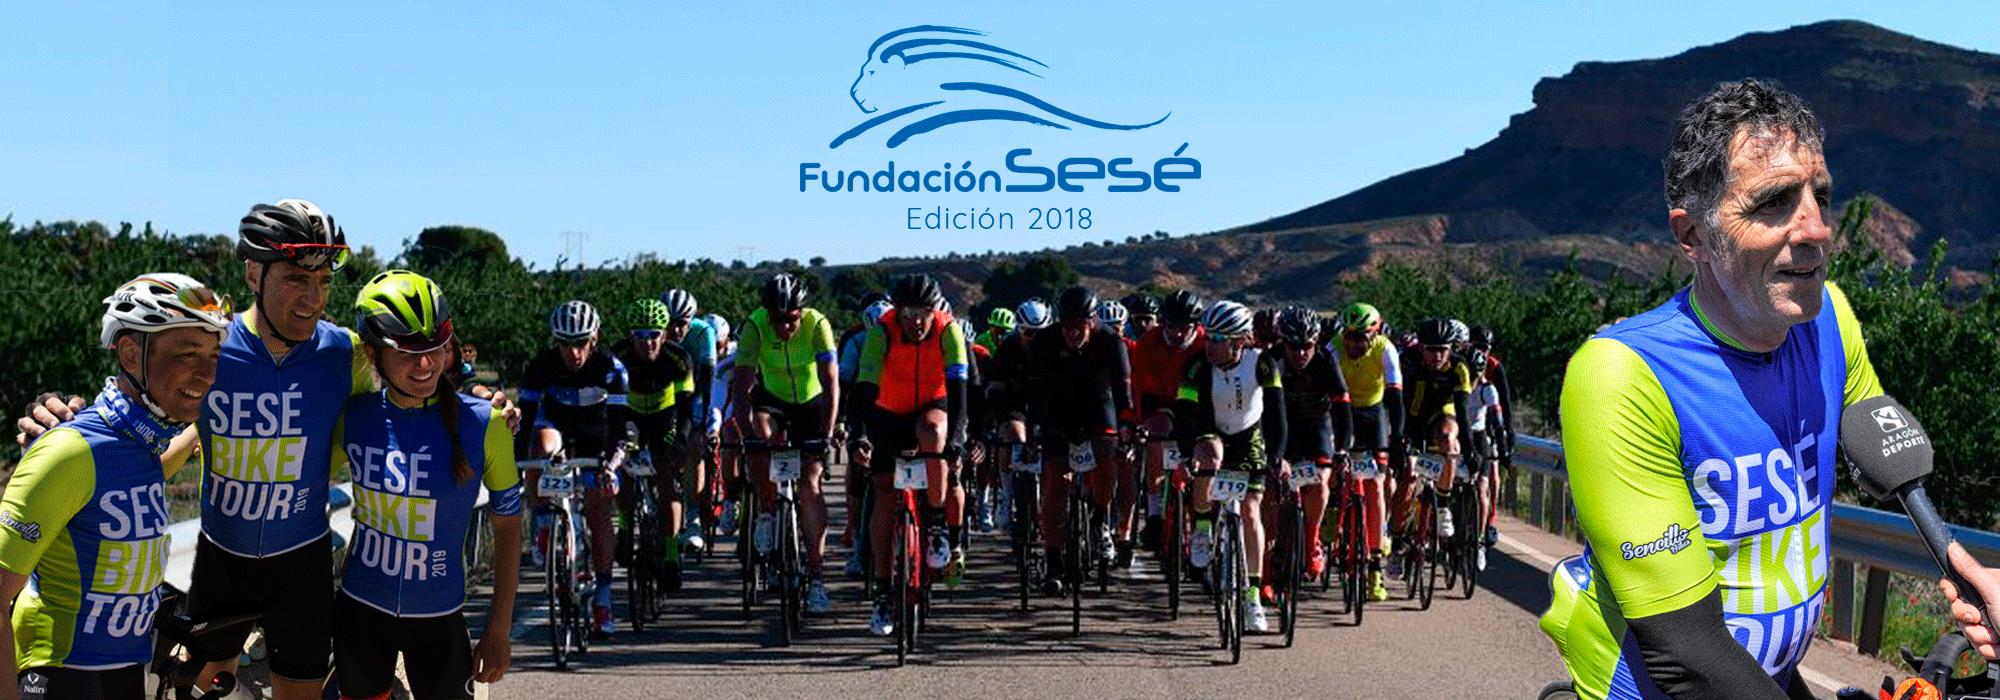 edicion-2018 sese-bike-tour